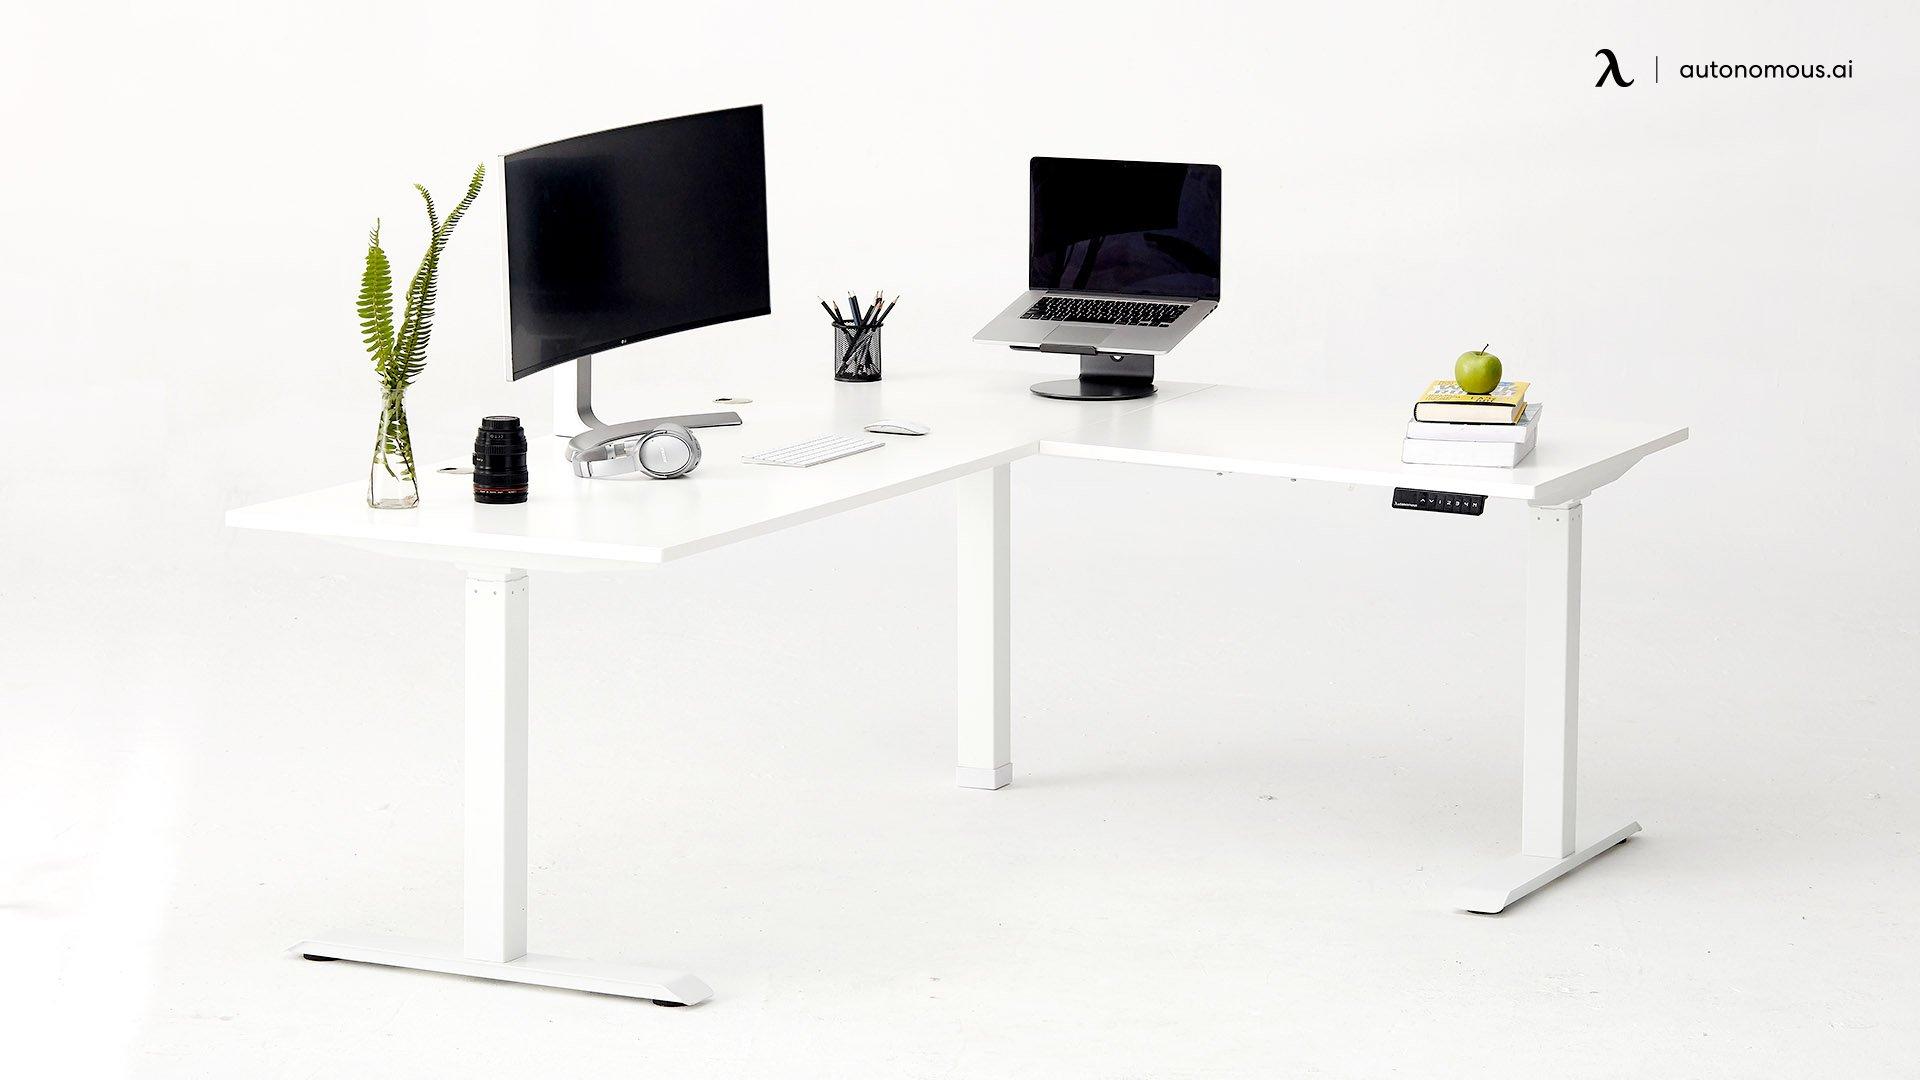 SmartDesk Corner is an l-shaped standing desk